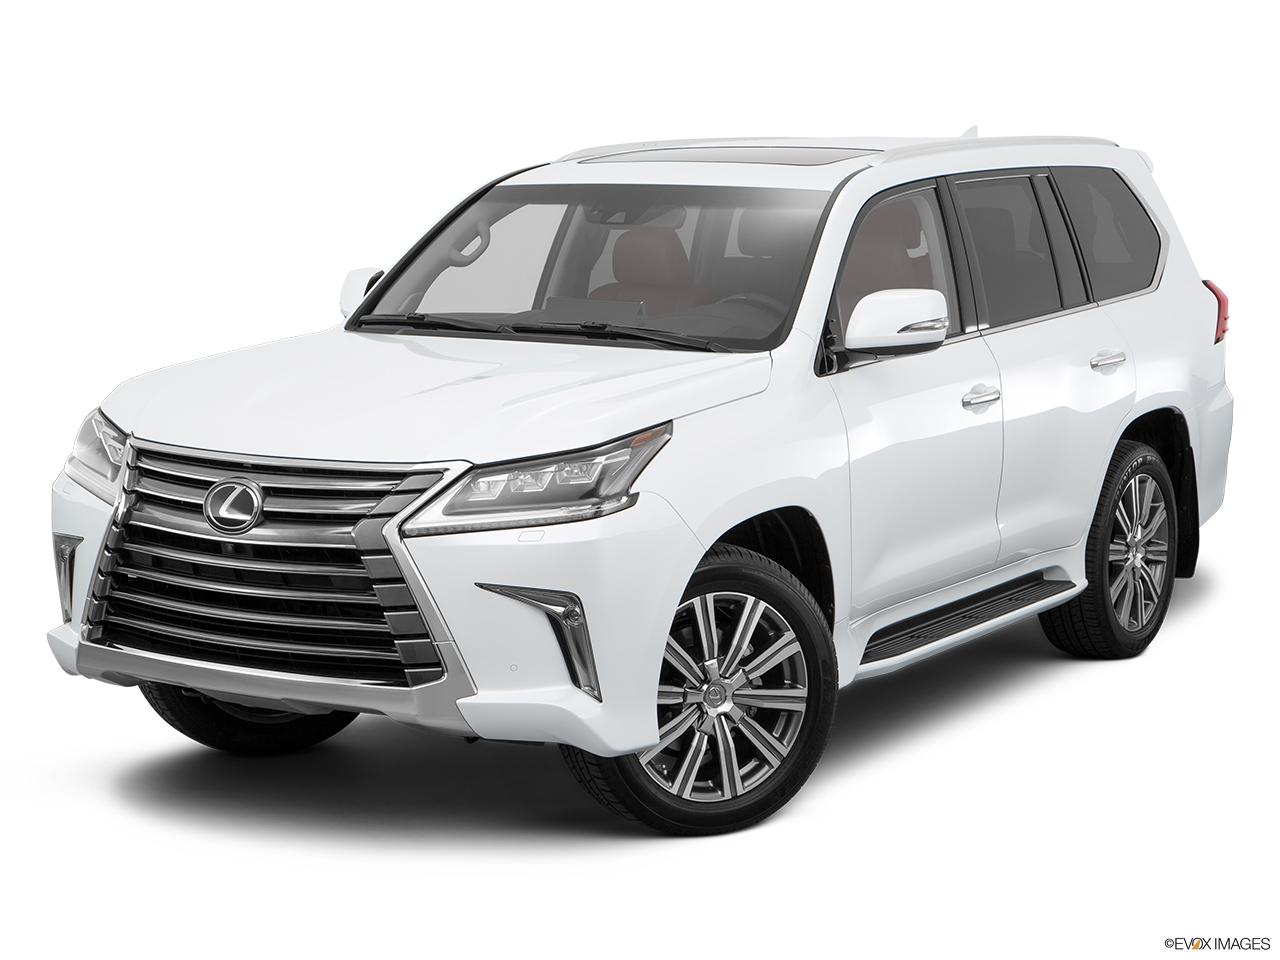 lexus lx 2017 570 platinum in saudi arabia new car prices specs reviews photos yallamotor. Black Bedroom Furniture Sets. Home Design Ideas